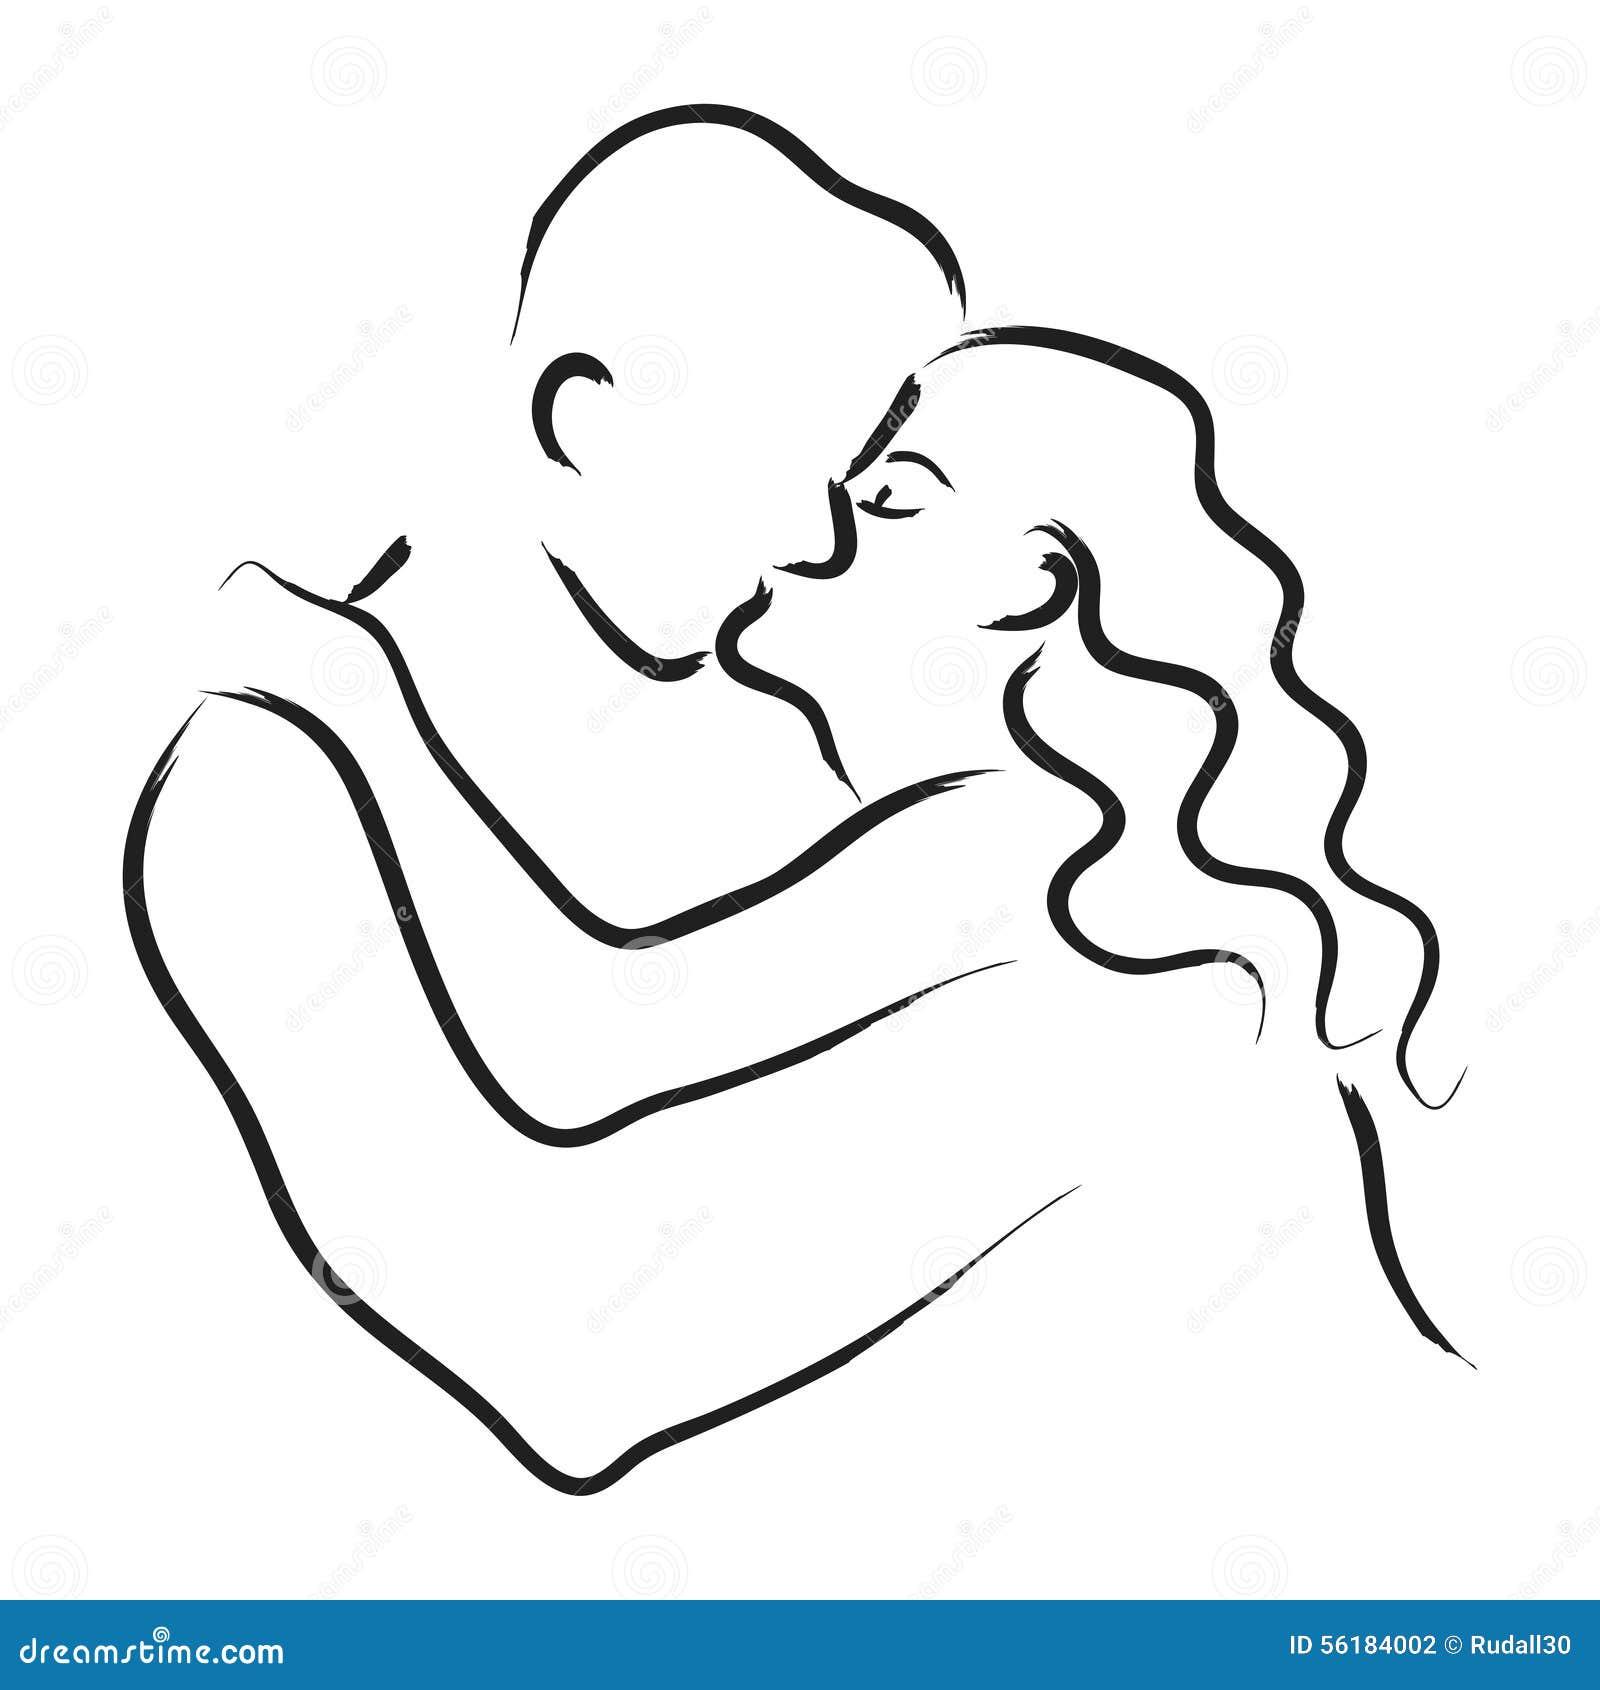 Line Drawing Couple : Line art of kissing couple cartoon vector cartoondealer